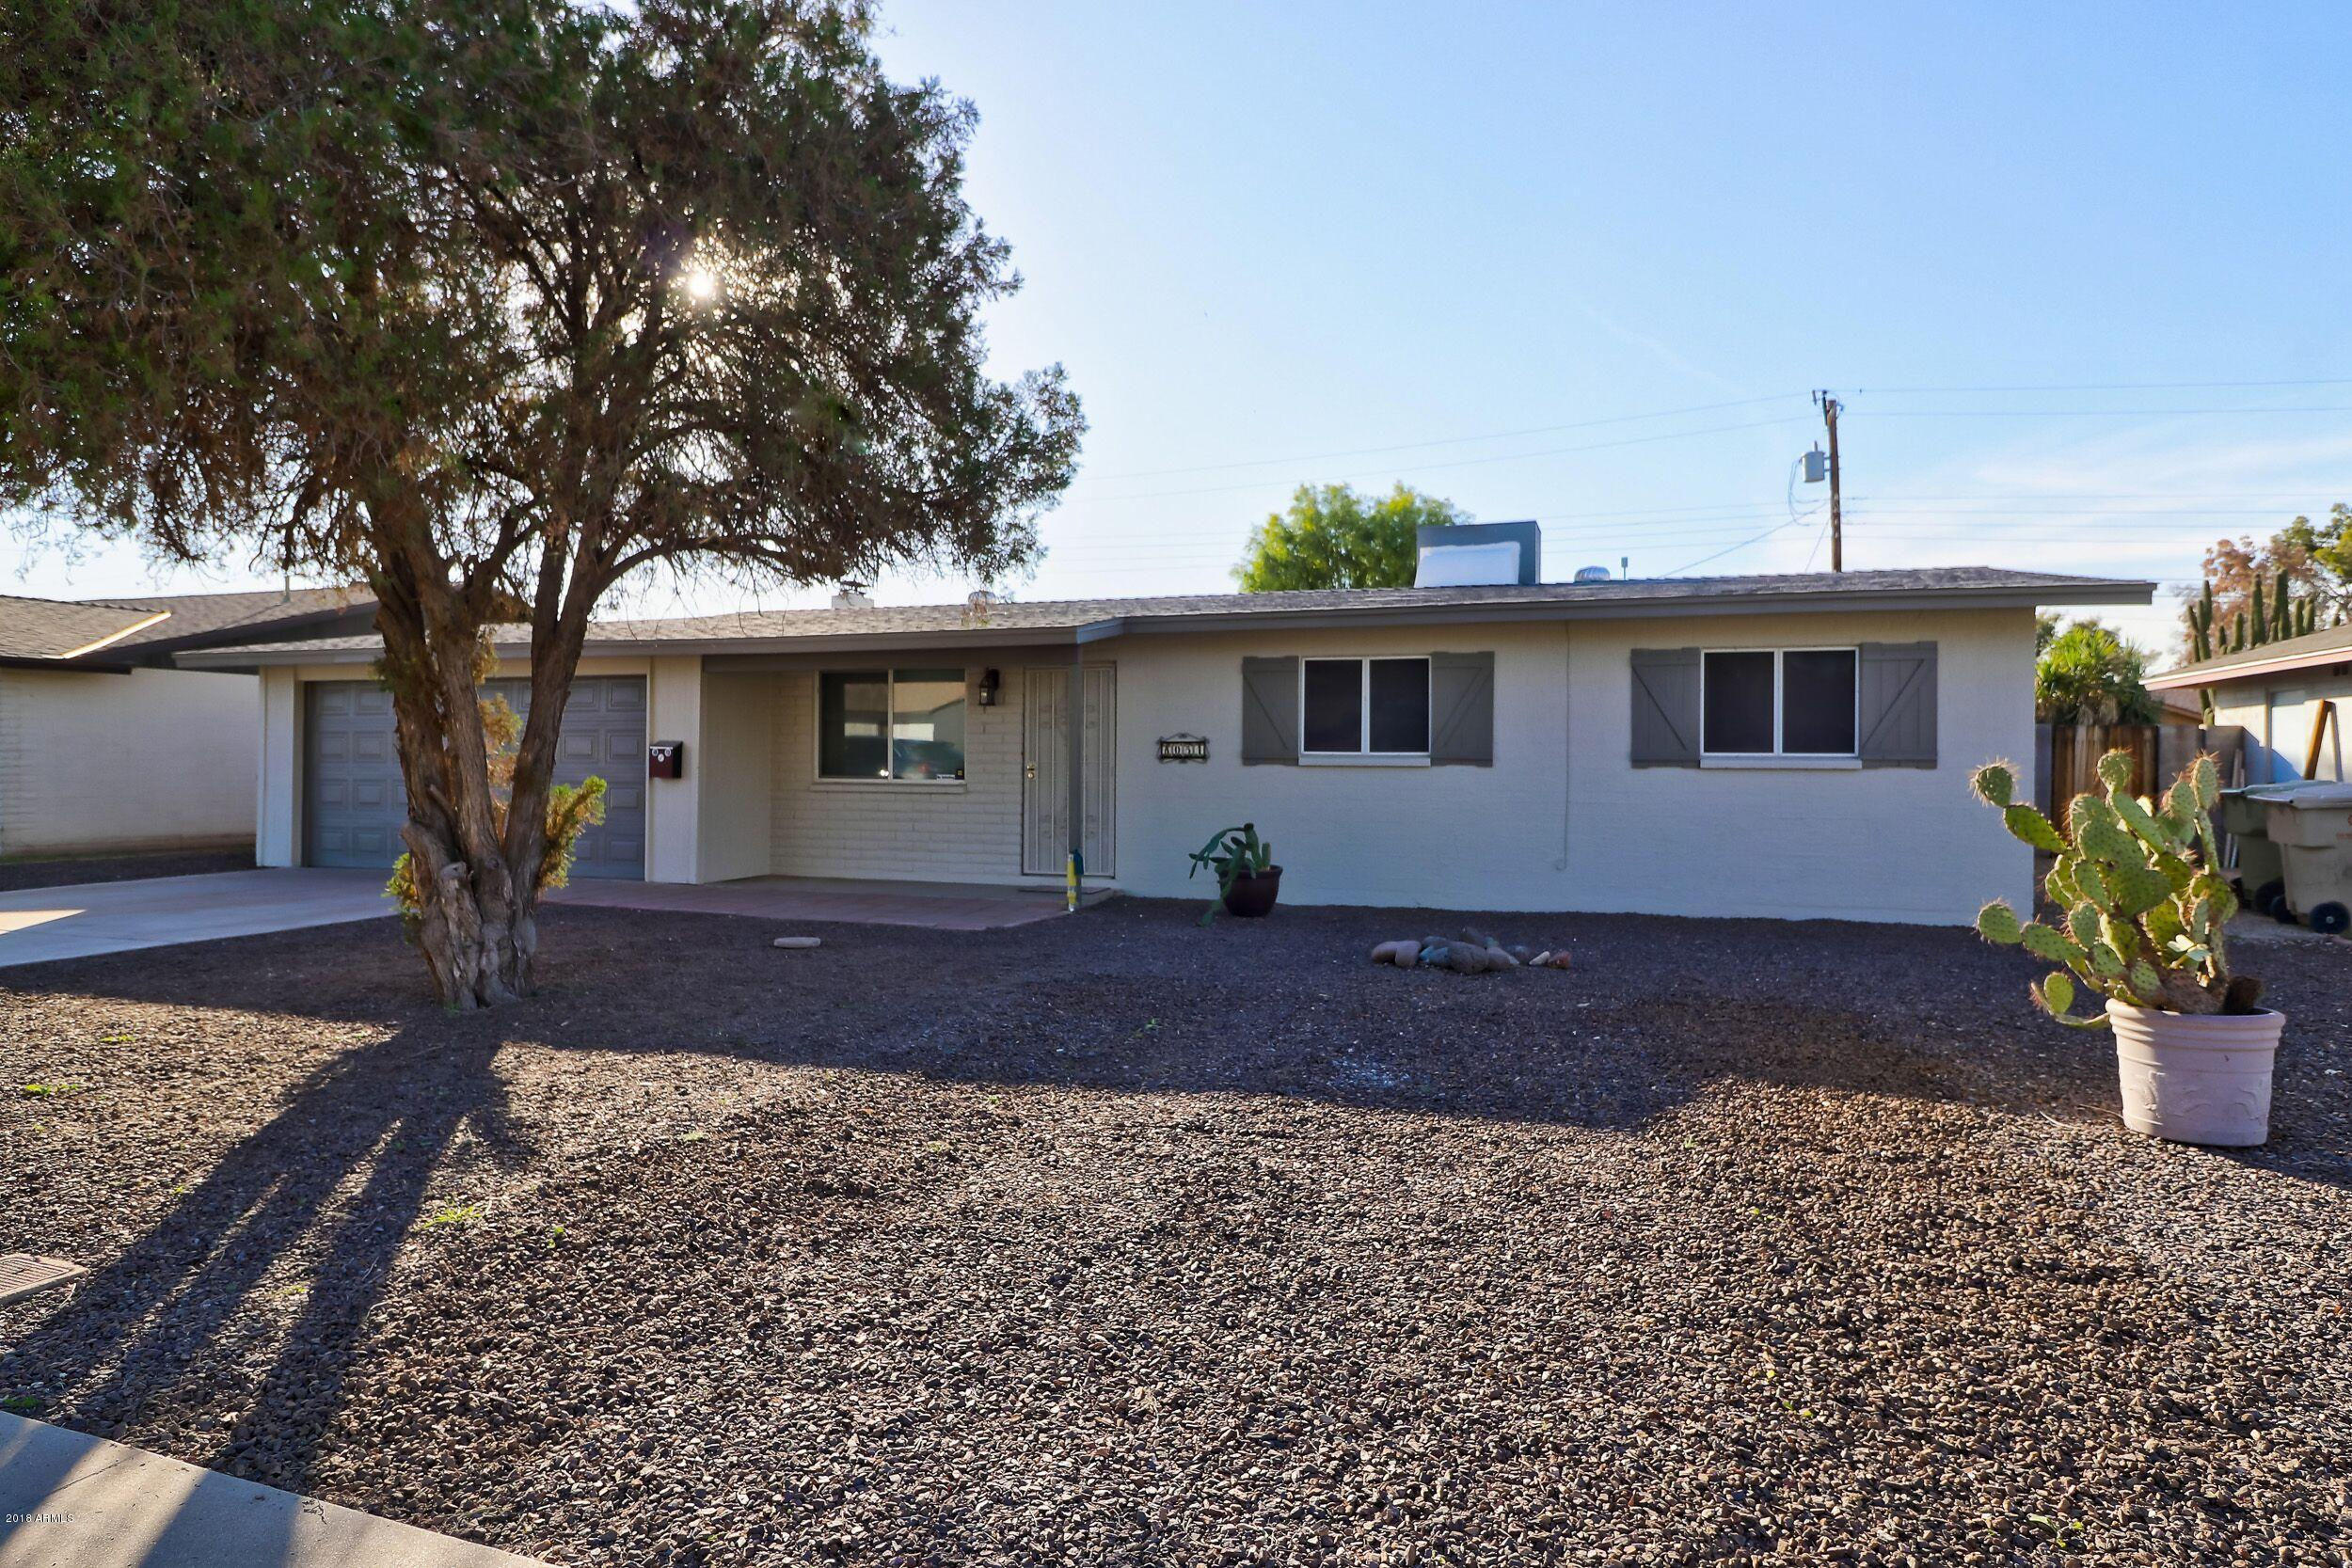 Photo of 8054 N 55TH Drive, Glendale, AZ 85302